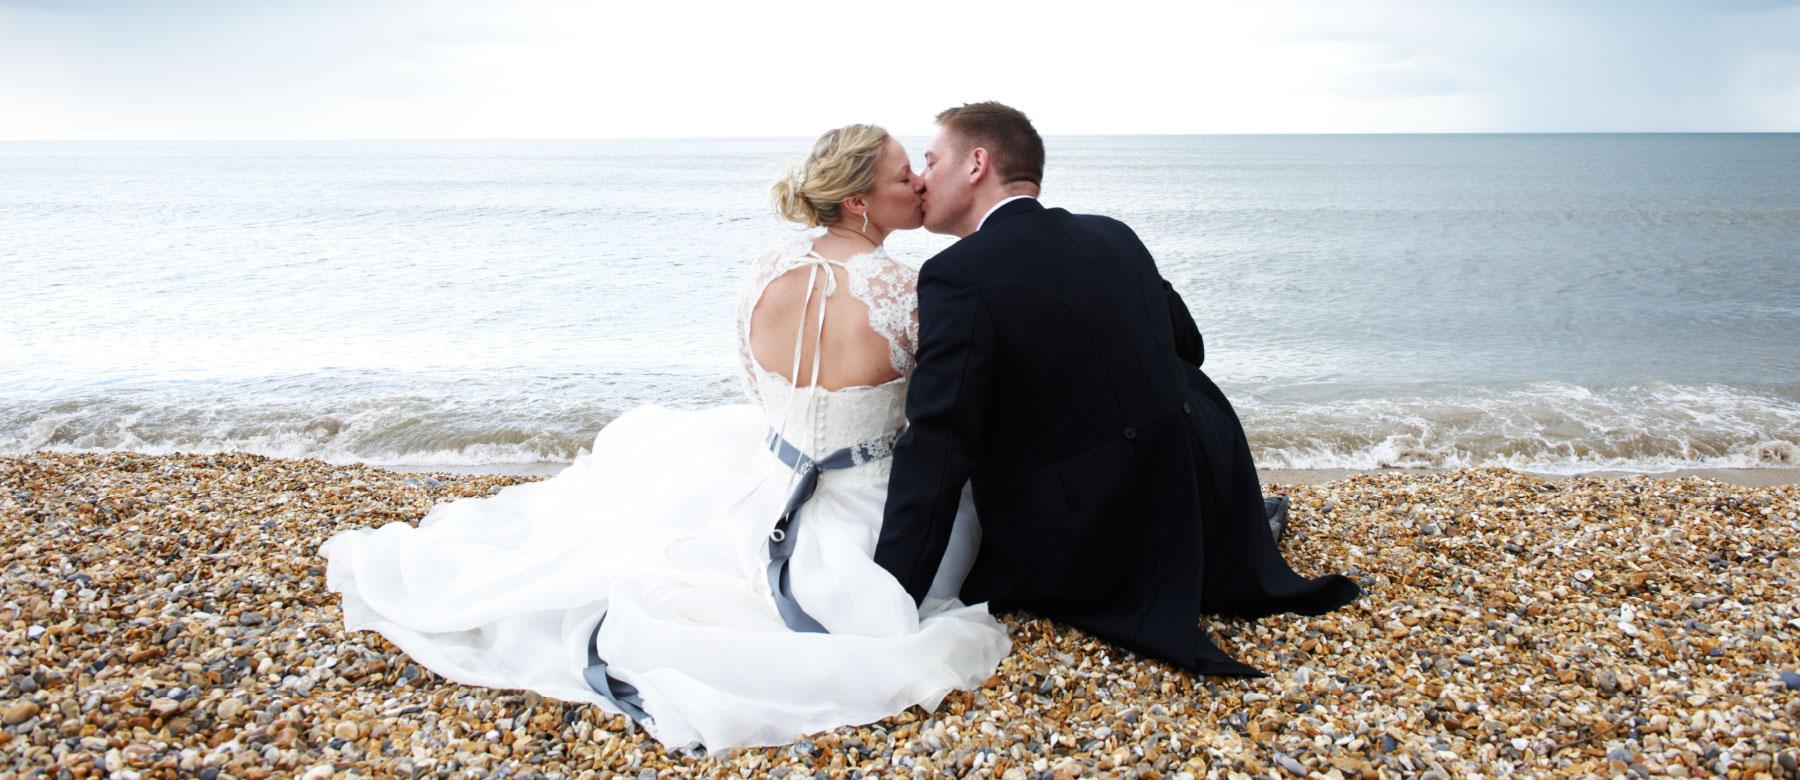 Wedding Rescue Service, Portsmouth, Stockbridge, Romsey, Dorchester